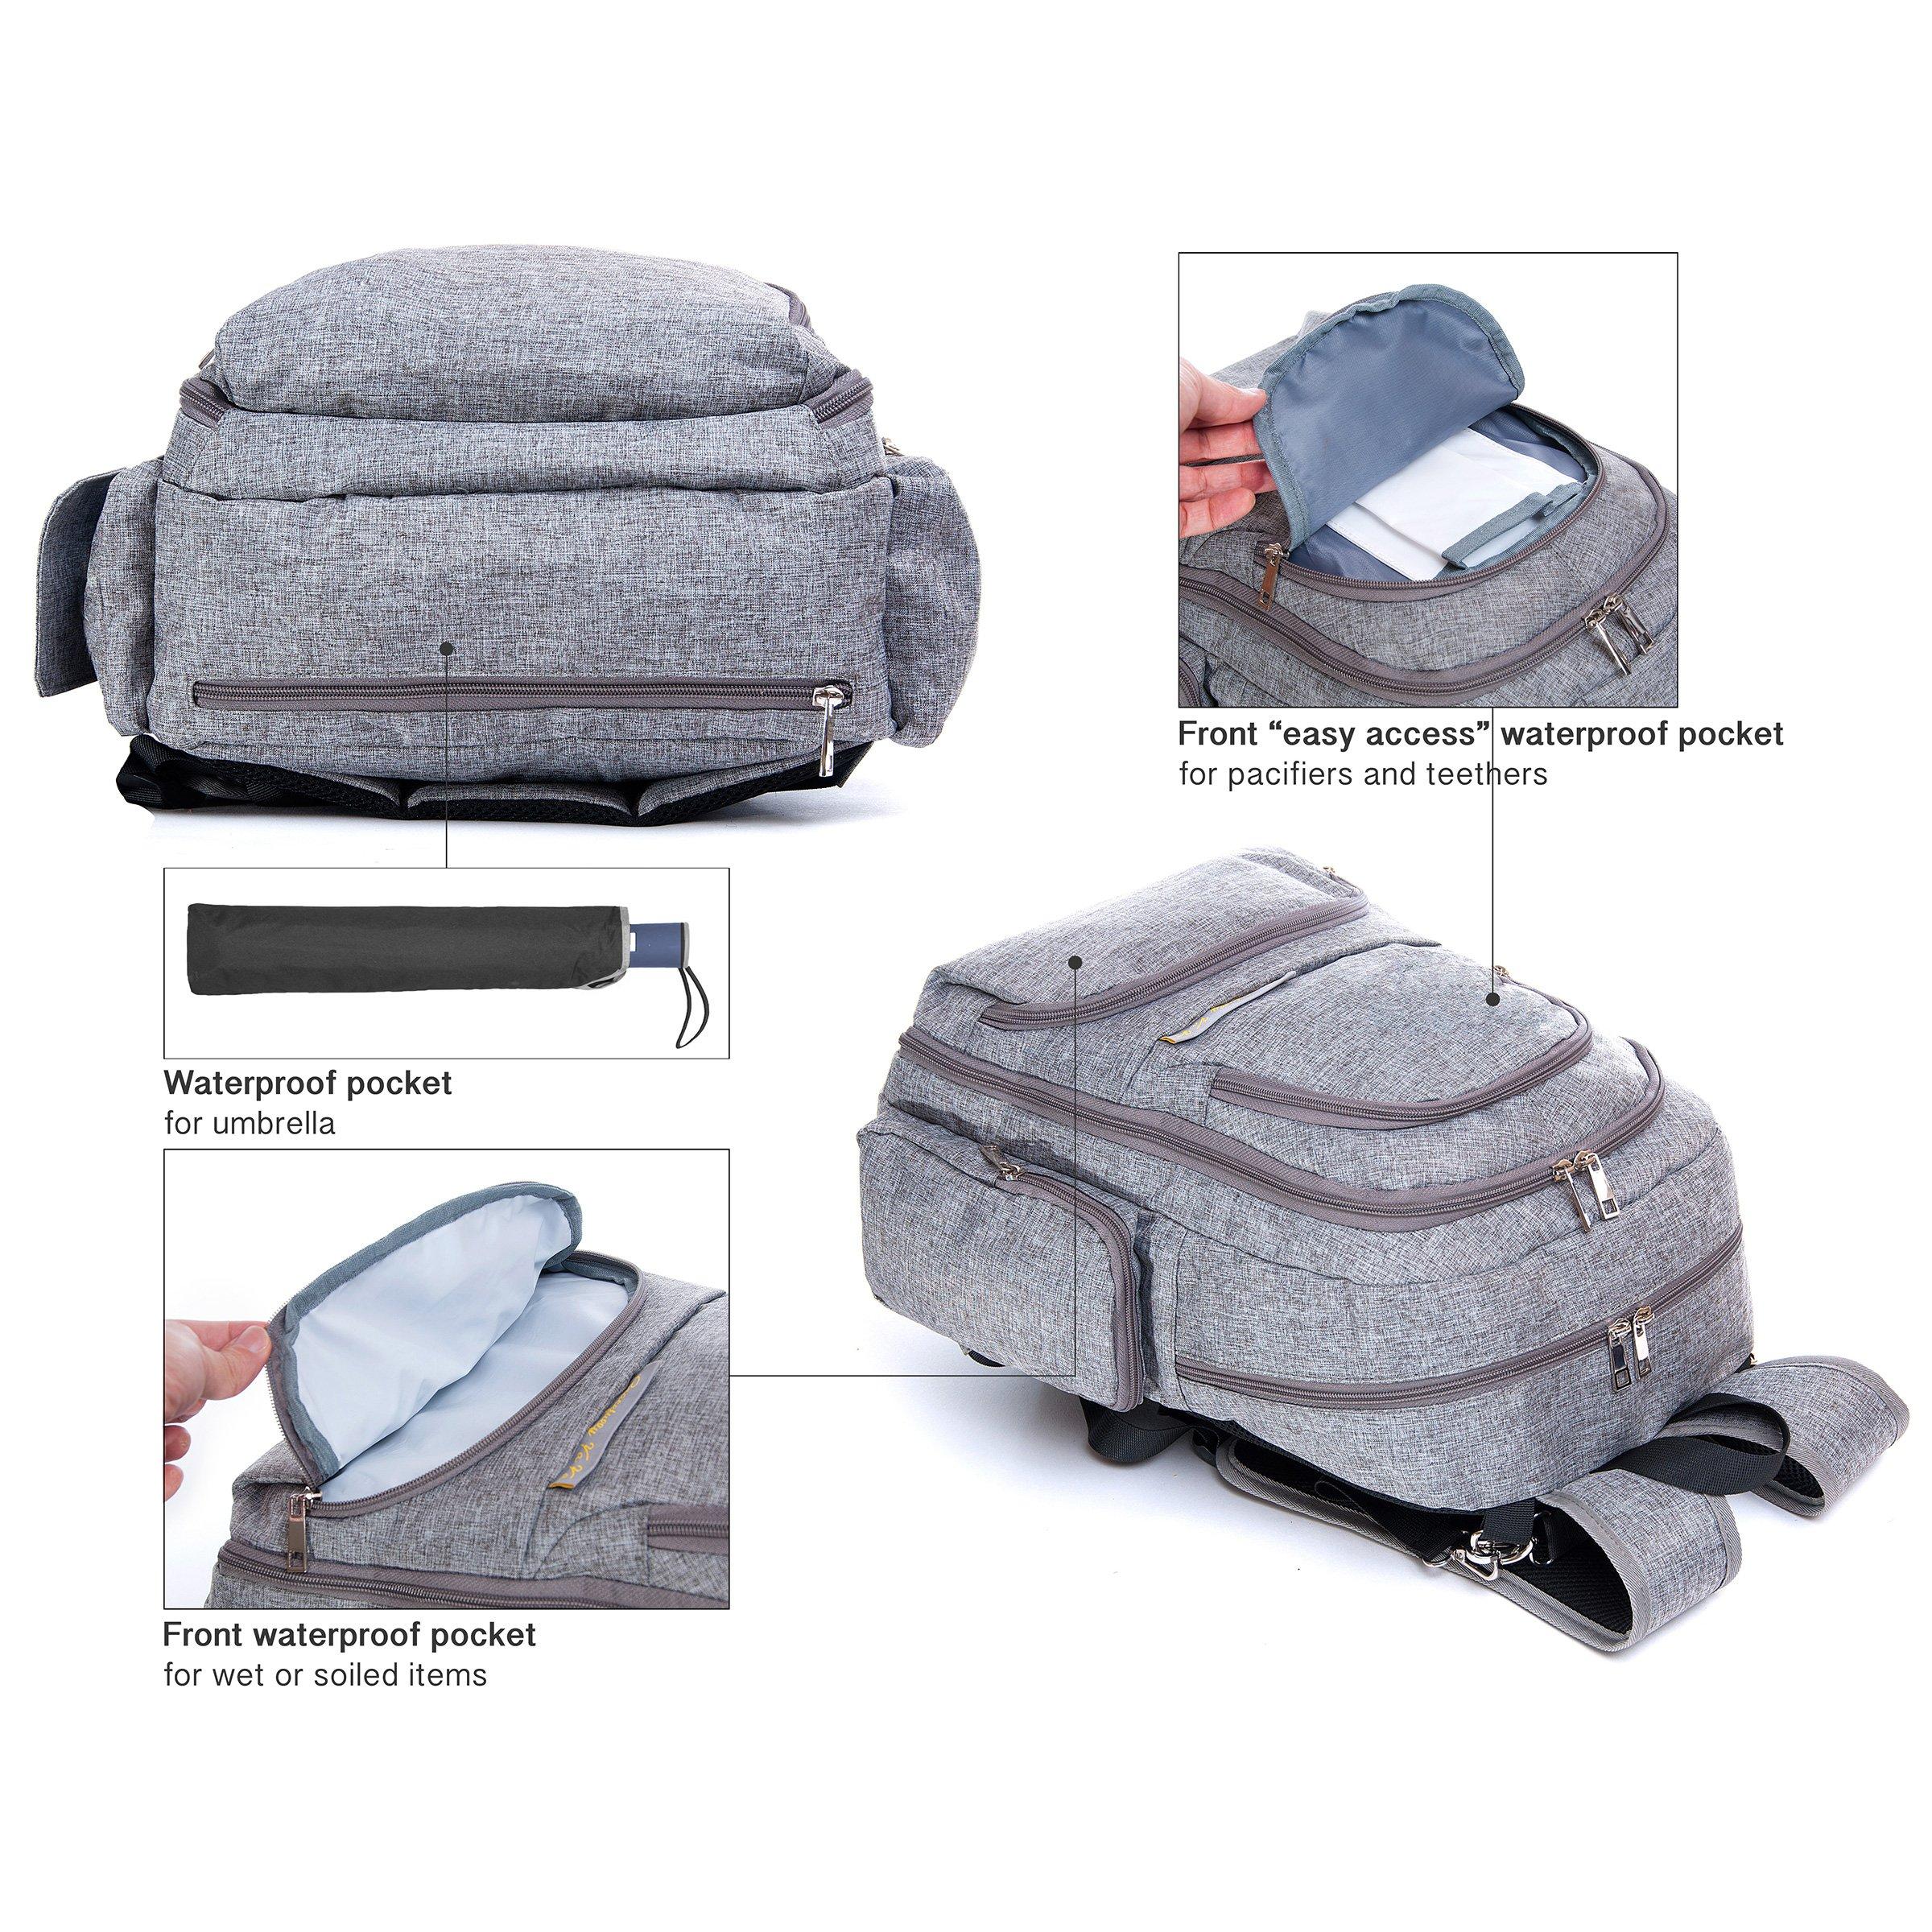 Galleon Yaya S Unisex Diaper Bag Backpack New Handmade